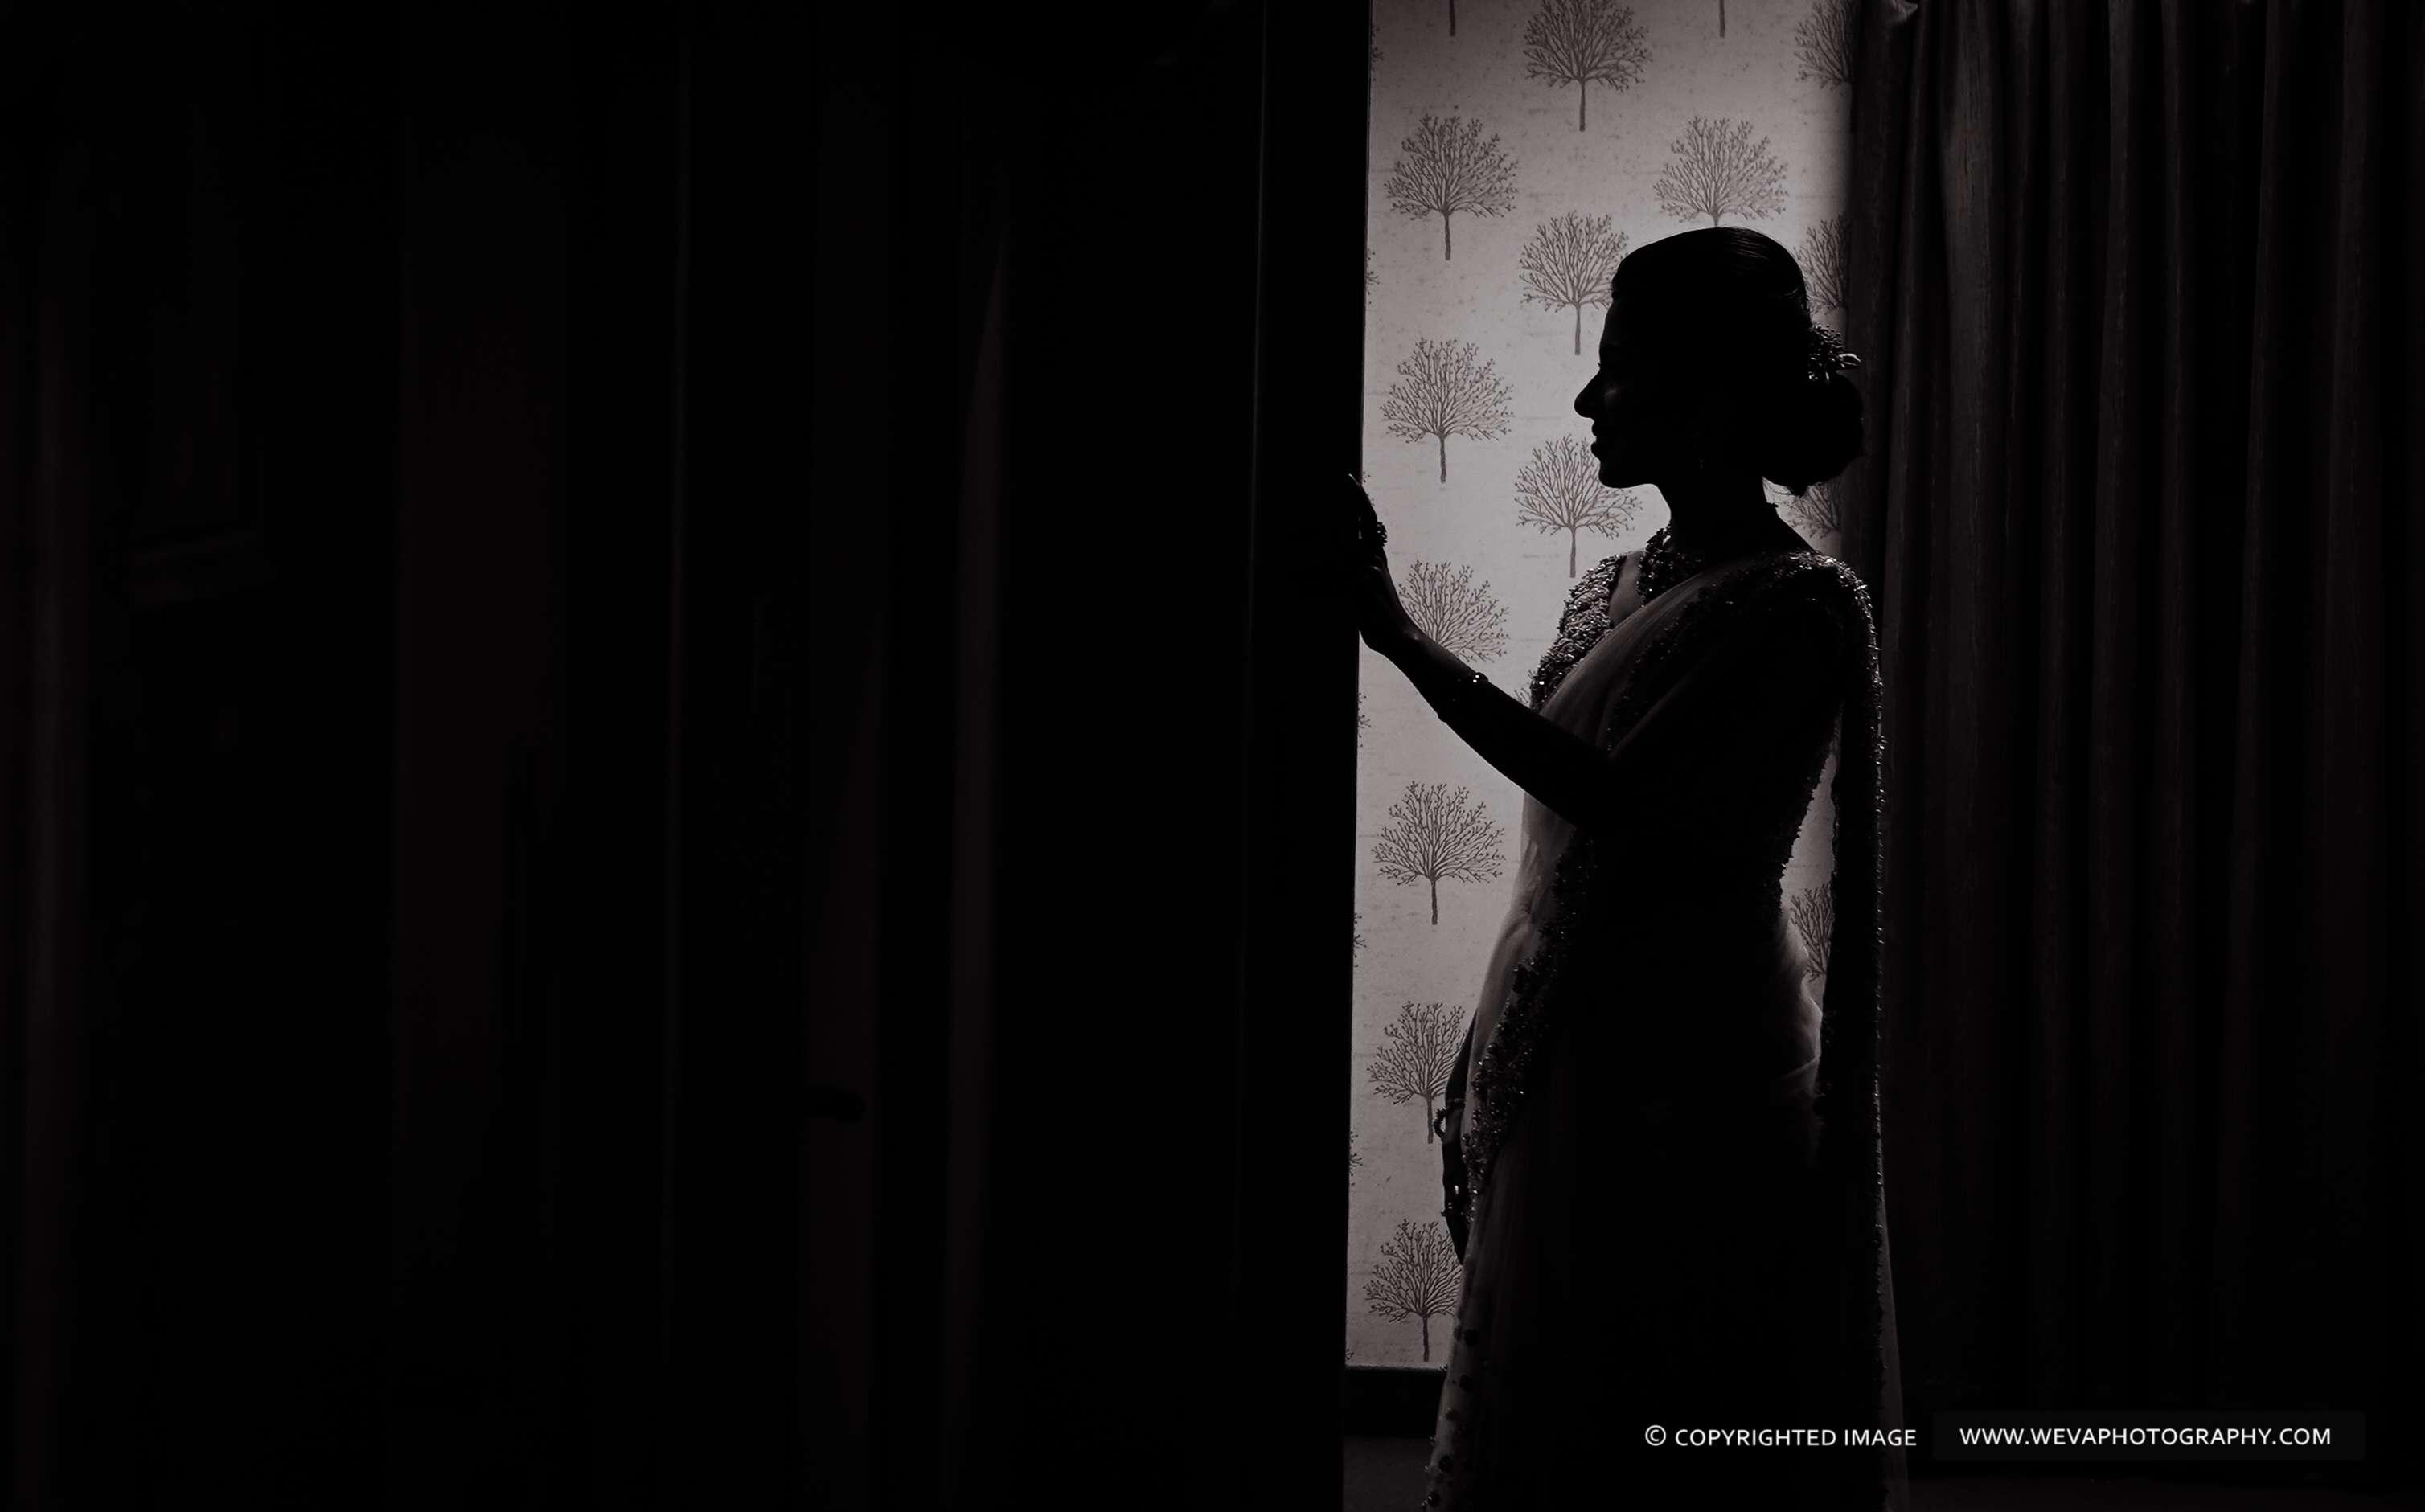 Weva Photography - Portfolio